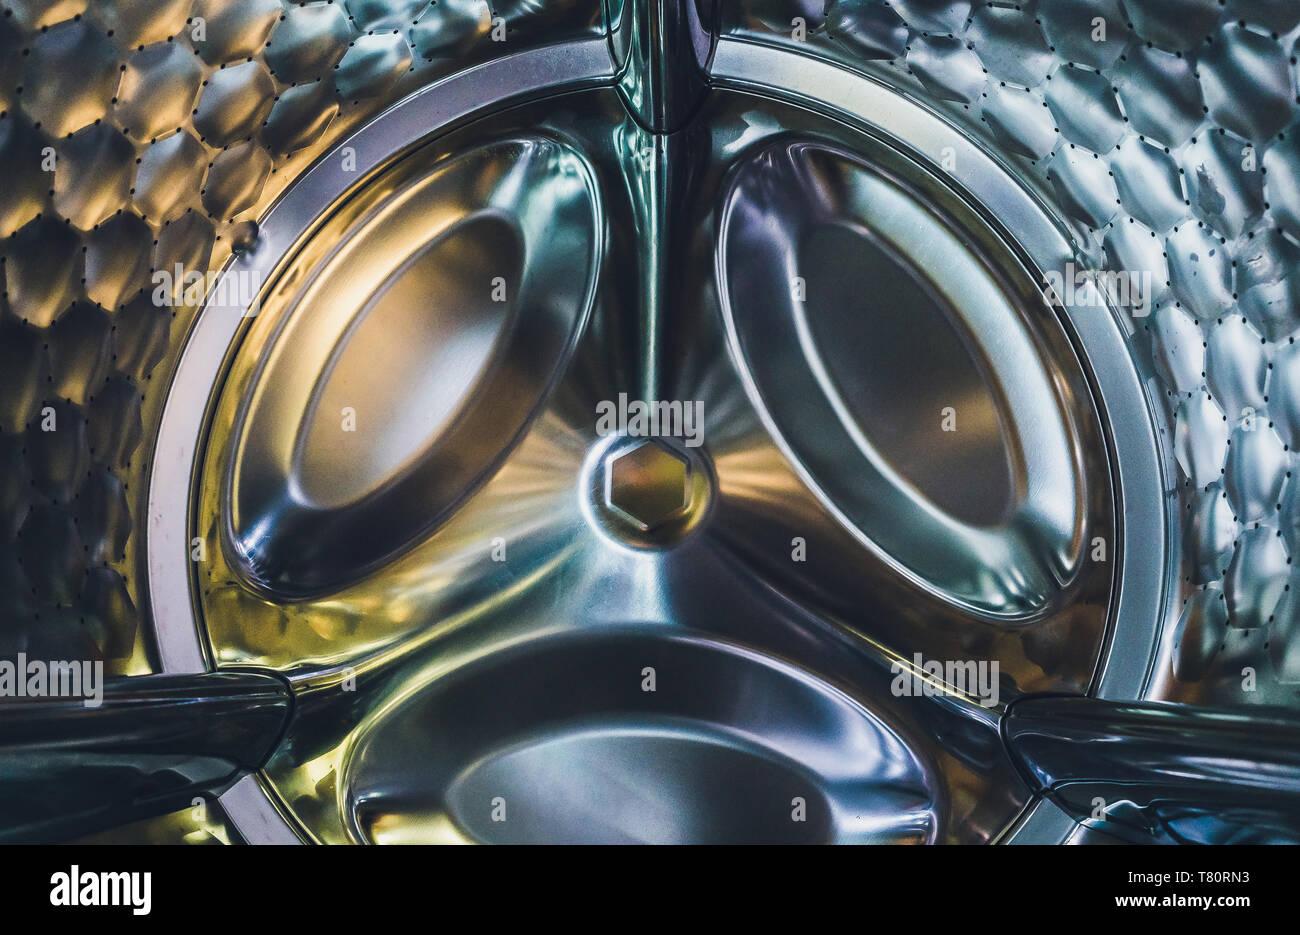 Washing machine drum interior, Internal view of an empty washing machine drum - Stock Image